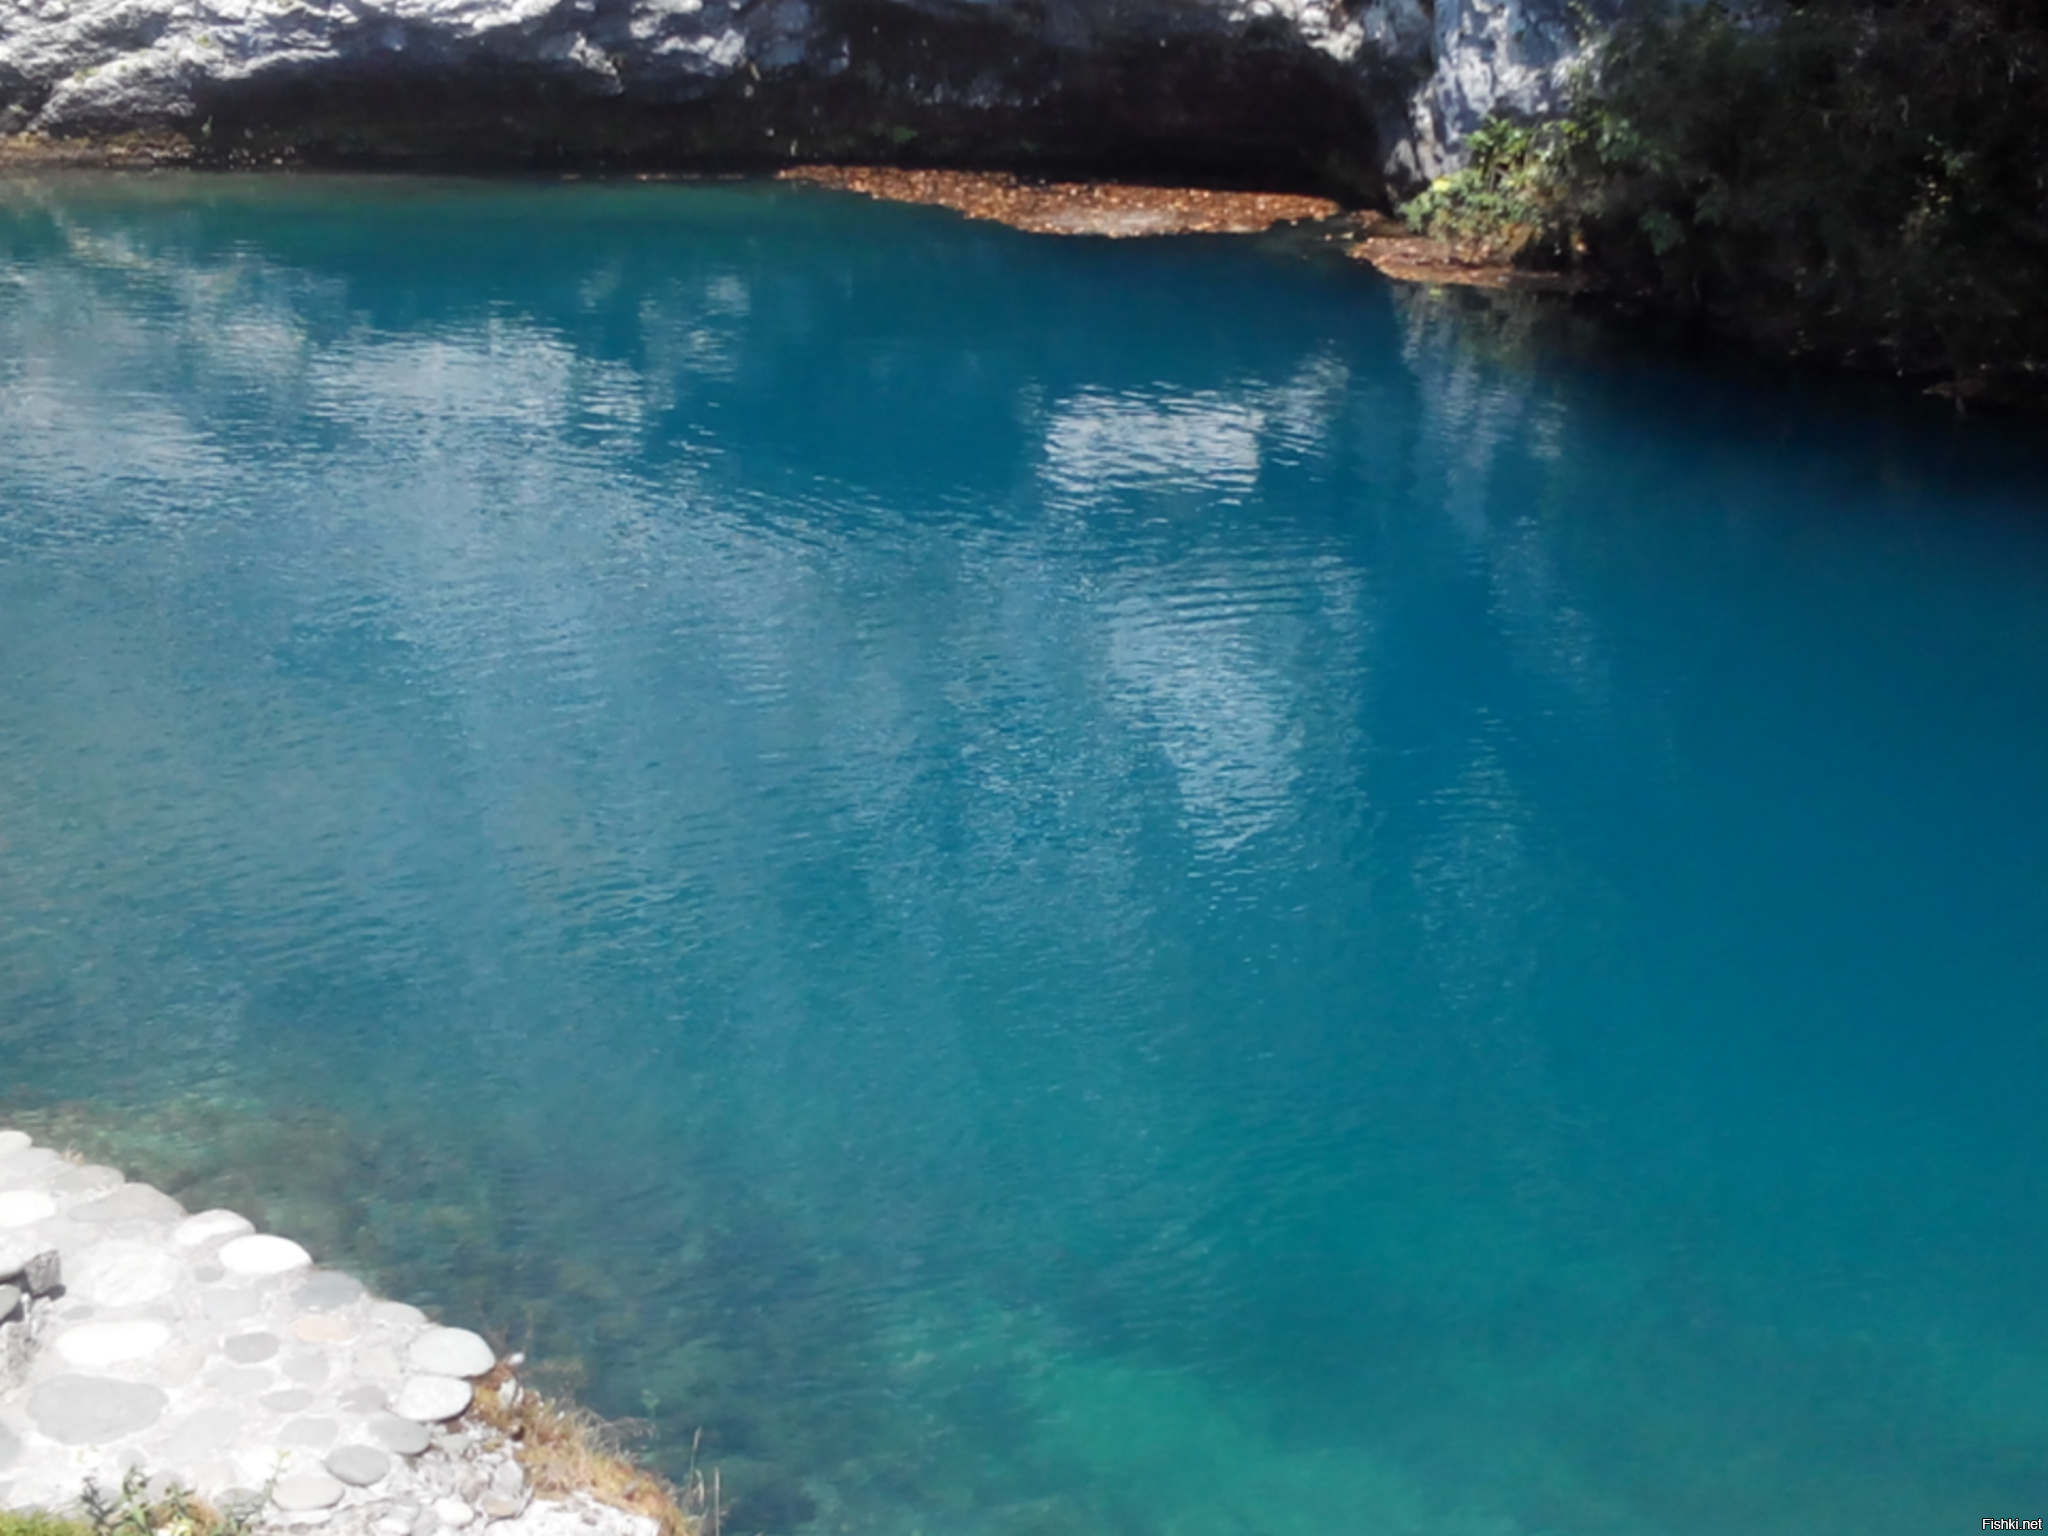 голубое озеро греция фото проект таков